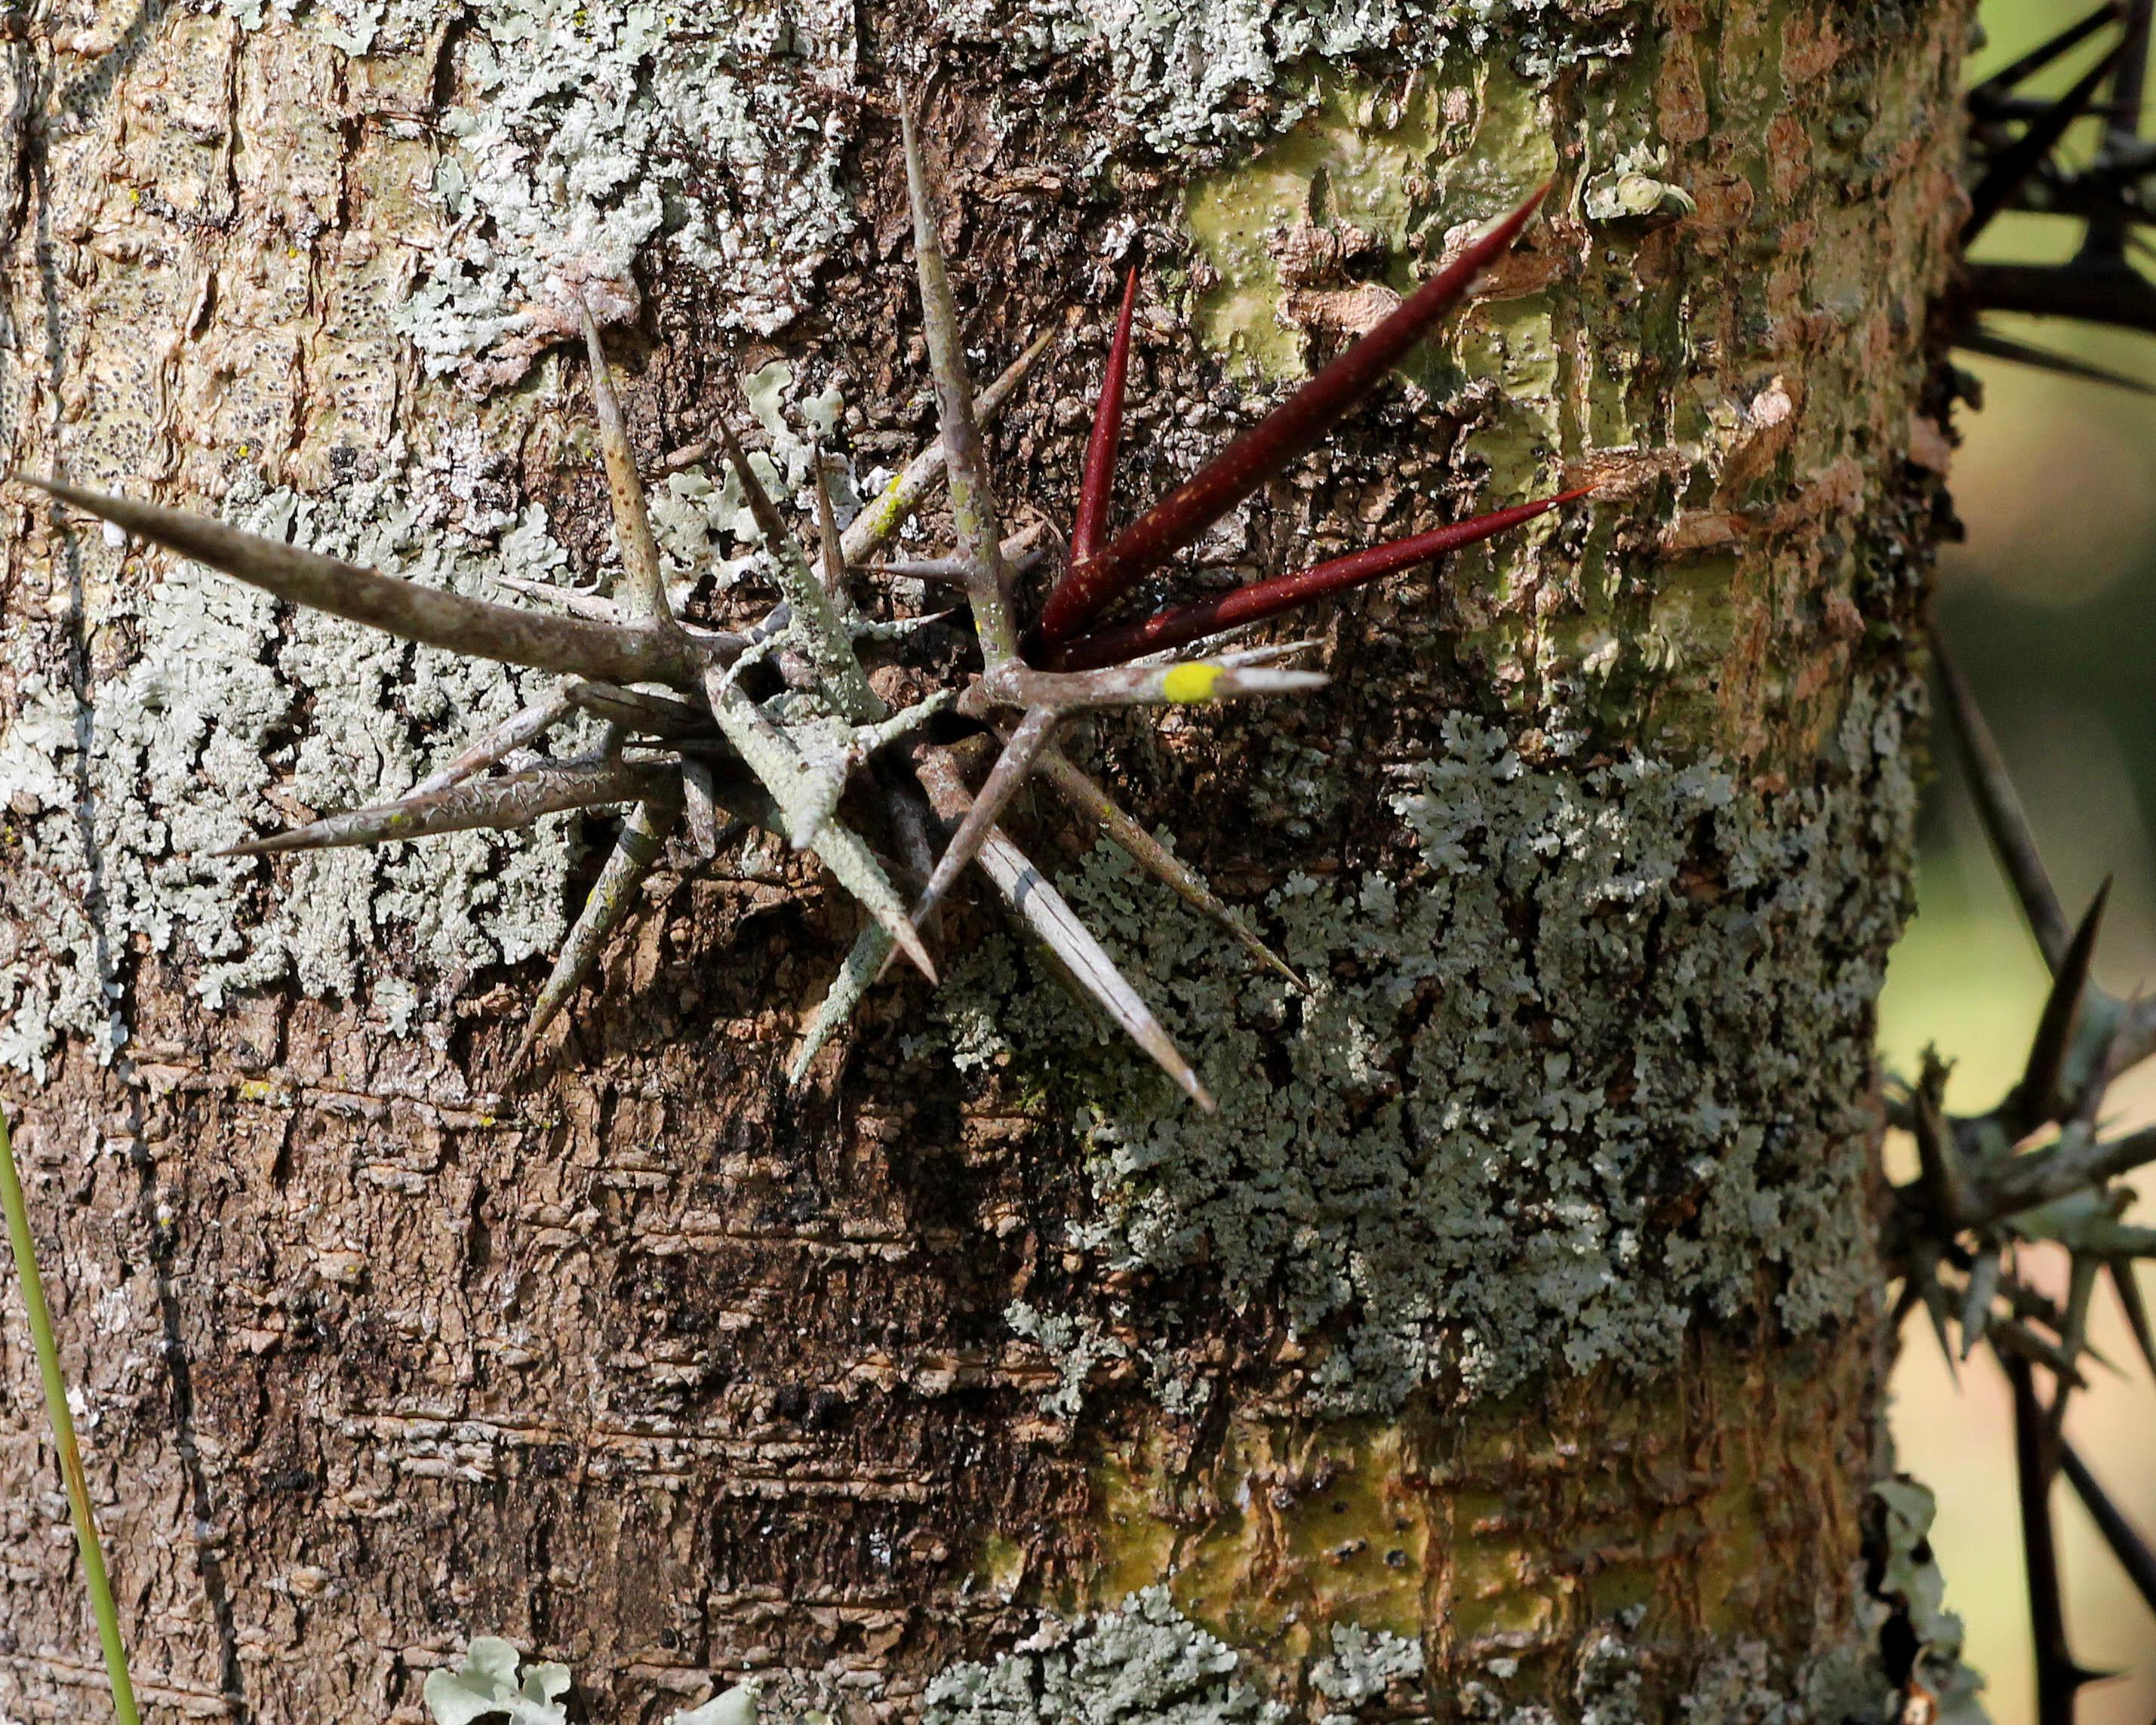 Image of water locust